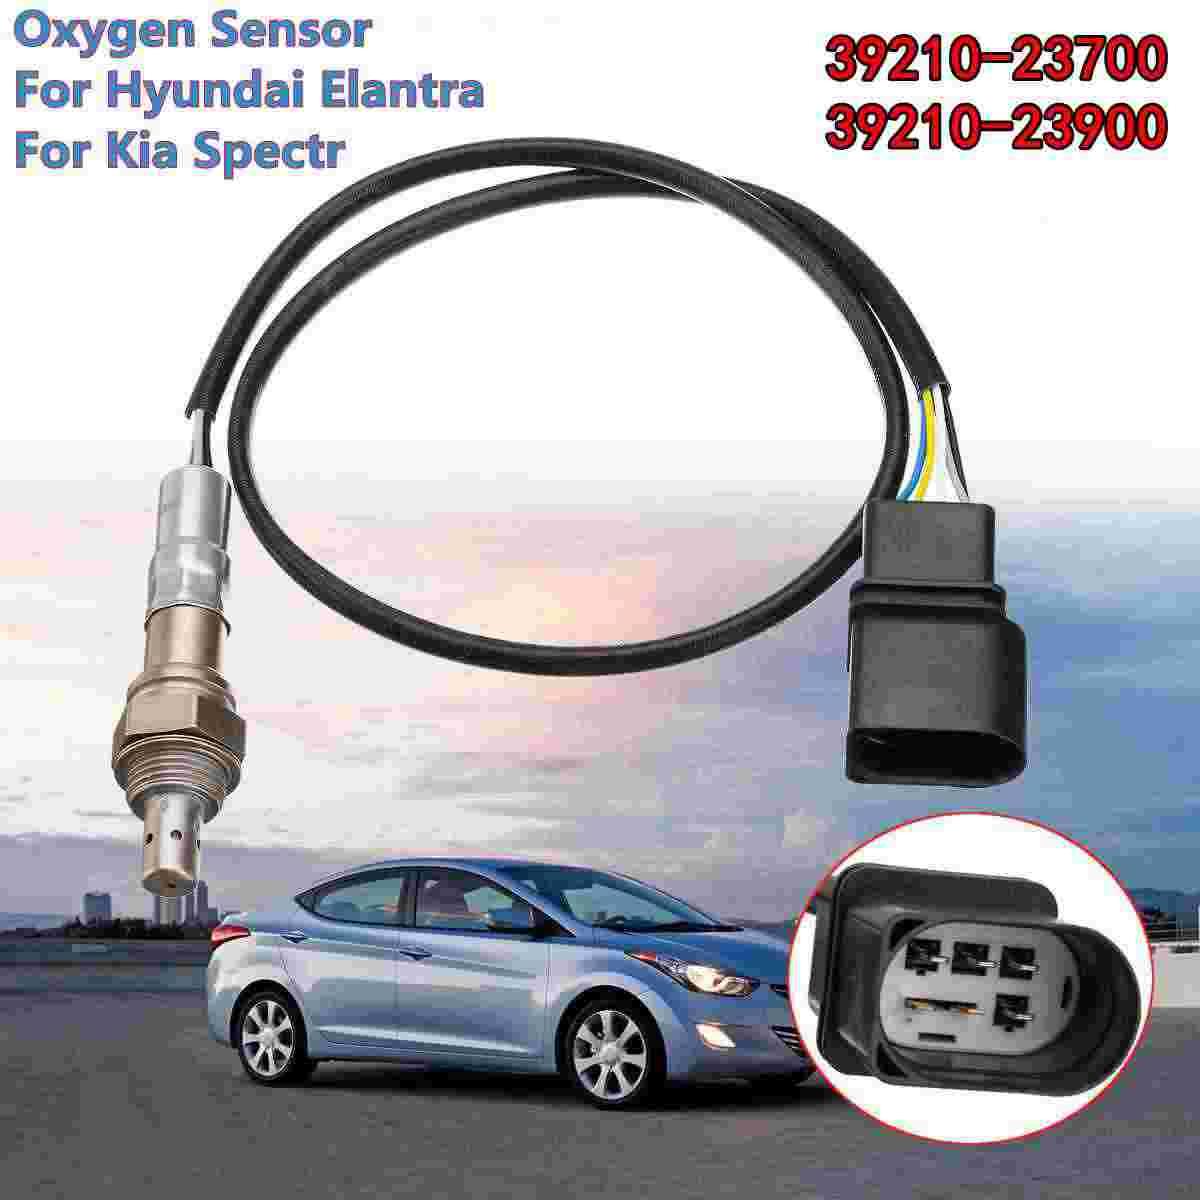 Matrix RAV4 Camry NEW STANDARD 234-4622 Oxygen Sensor-OE Style Fits- Toyota